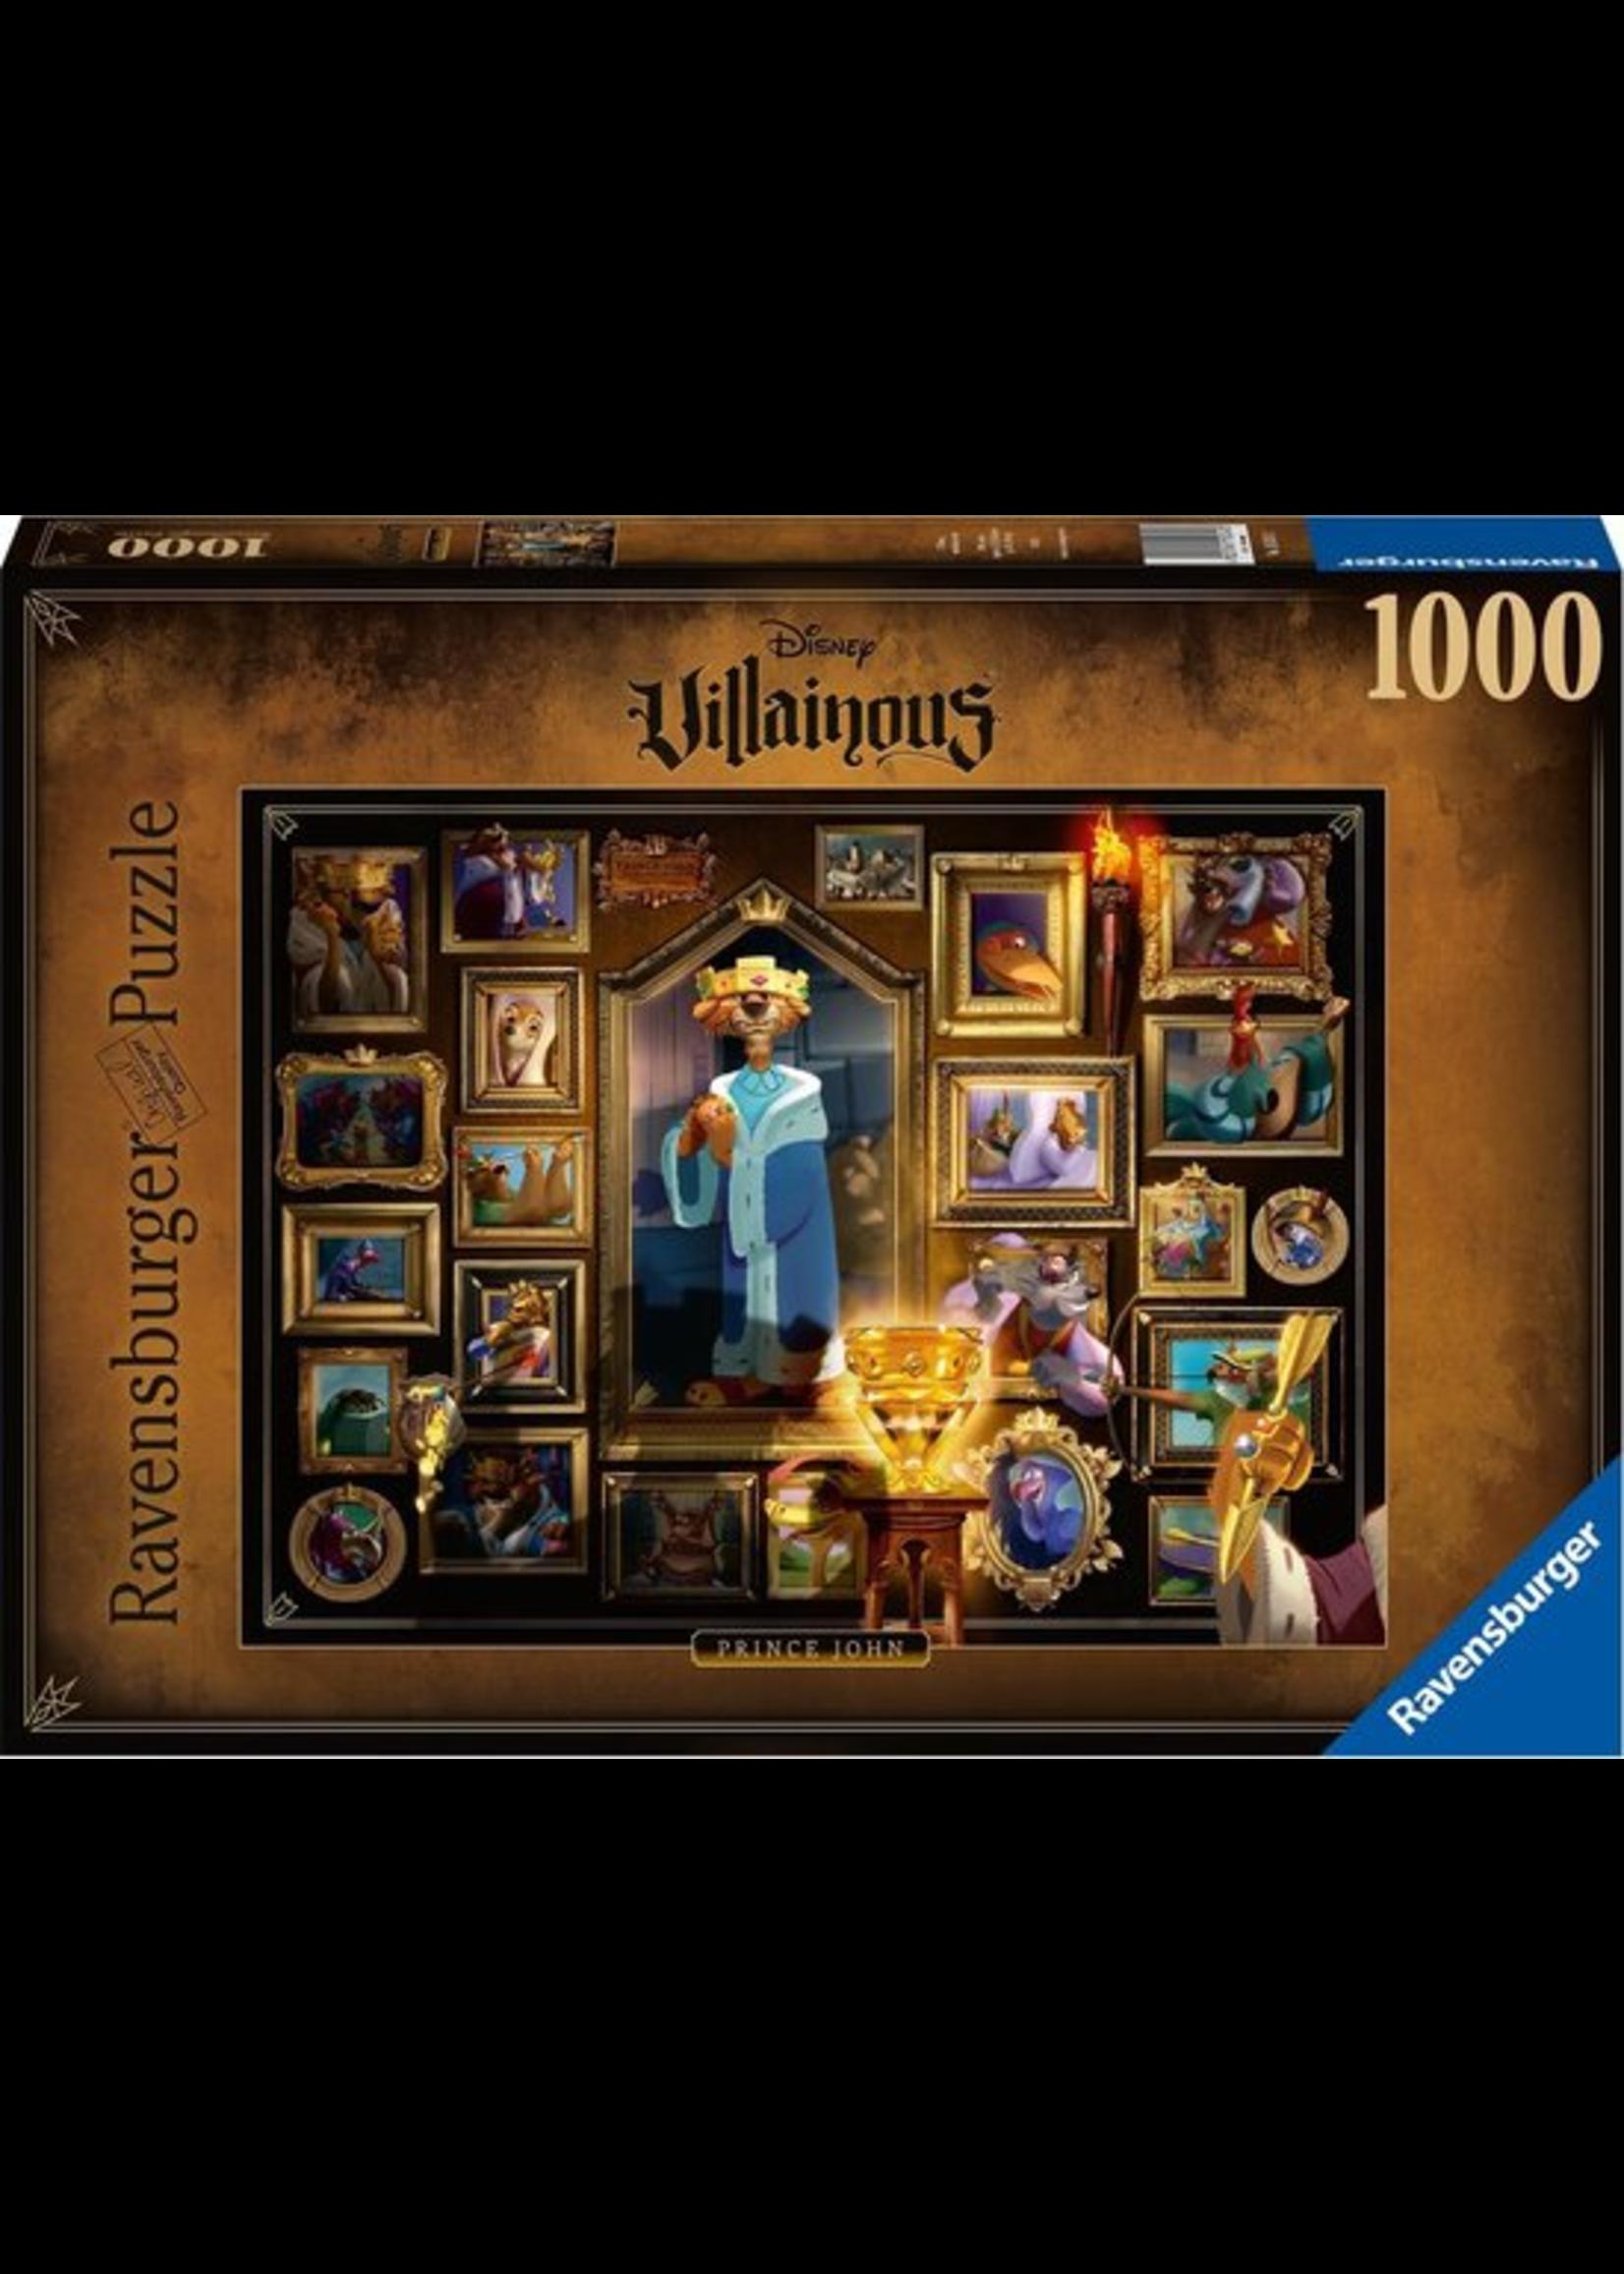 Disney Villainous - King John (1000)